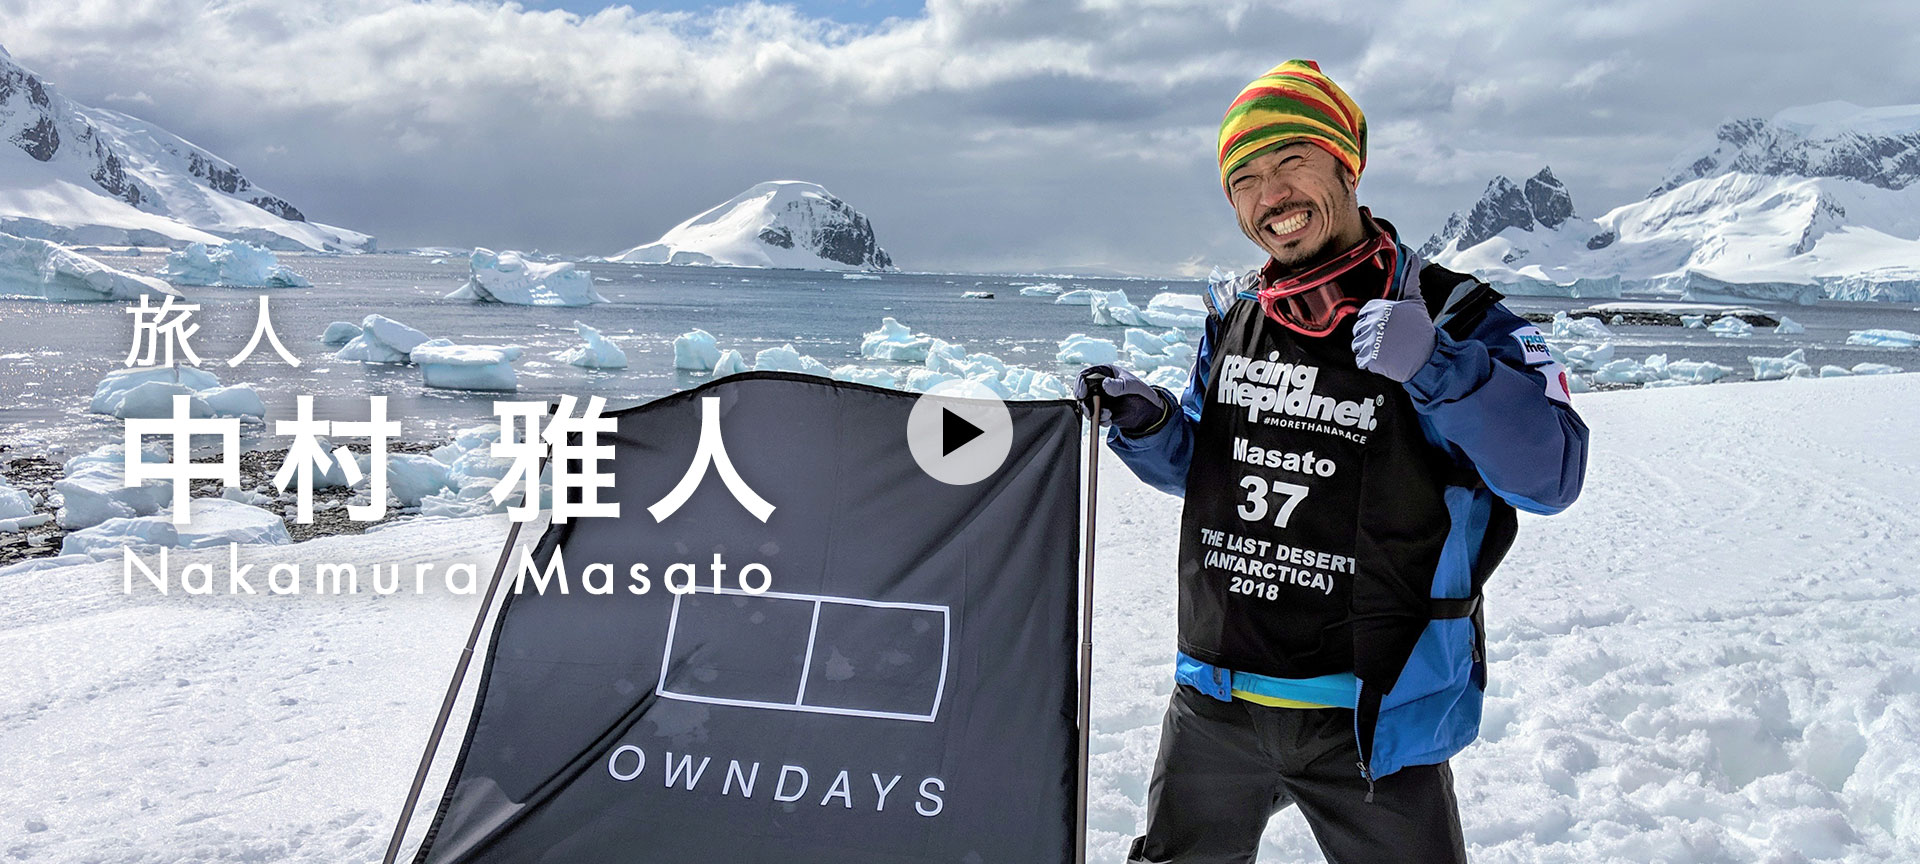 OWNDAYS MEETS 中村雅人(Masato Nakamura)